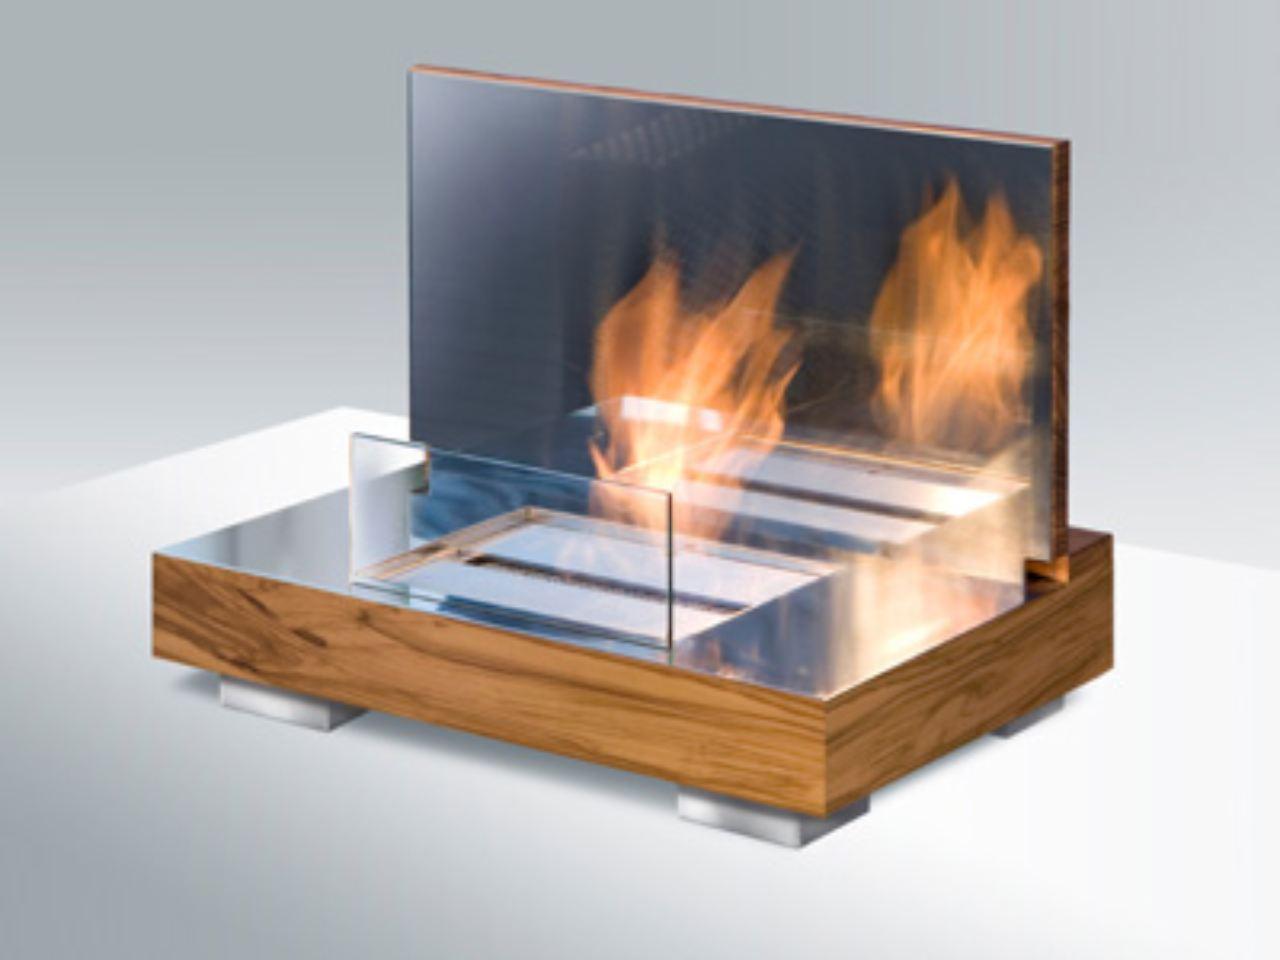 riskante ethanol kamine warentest warnt vor deko feuer n. Black Bedroom Furniture Sets. Home Design Ideas